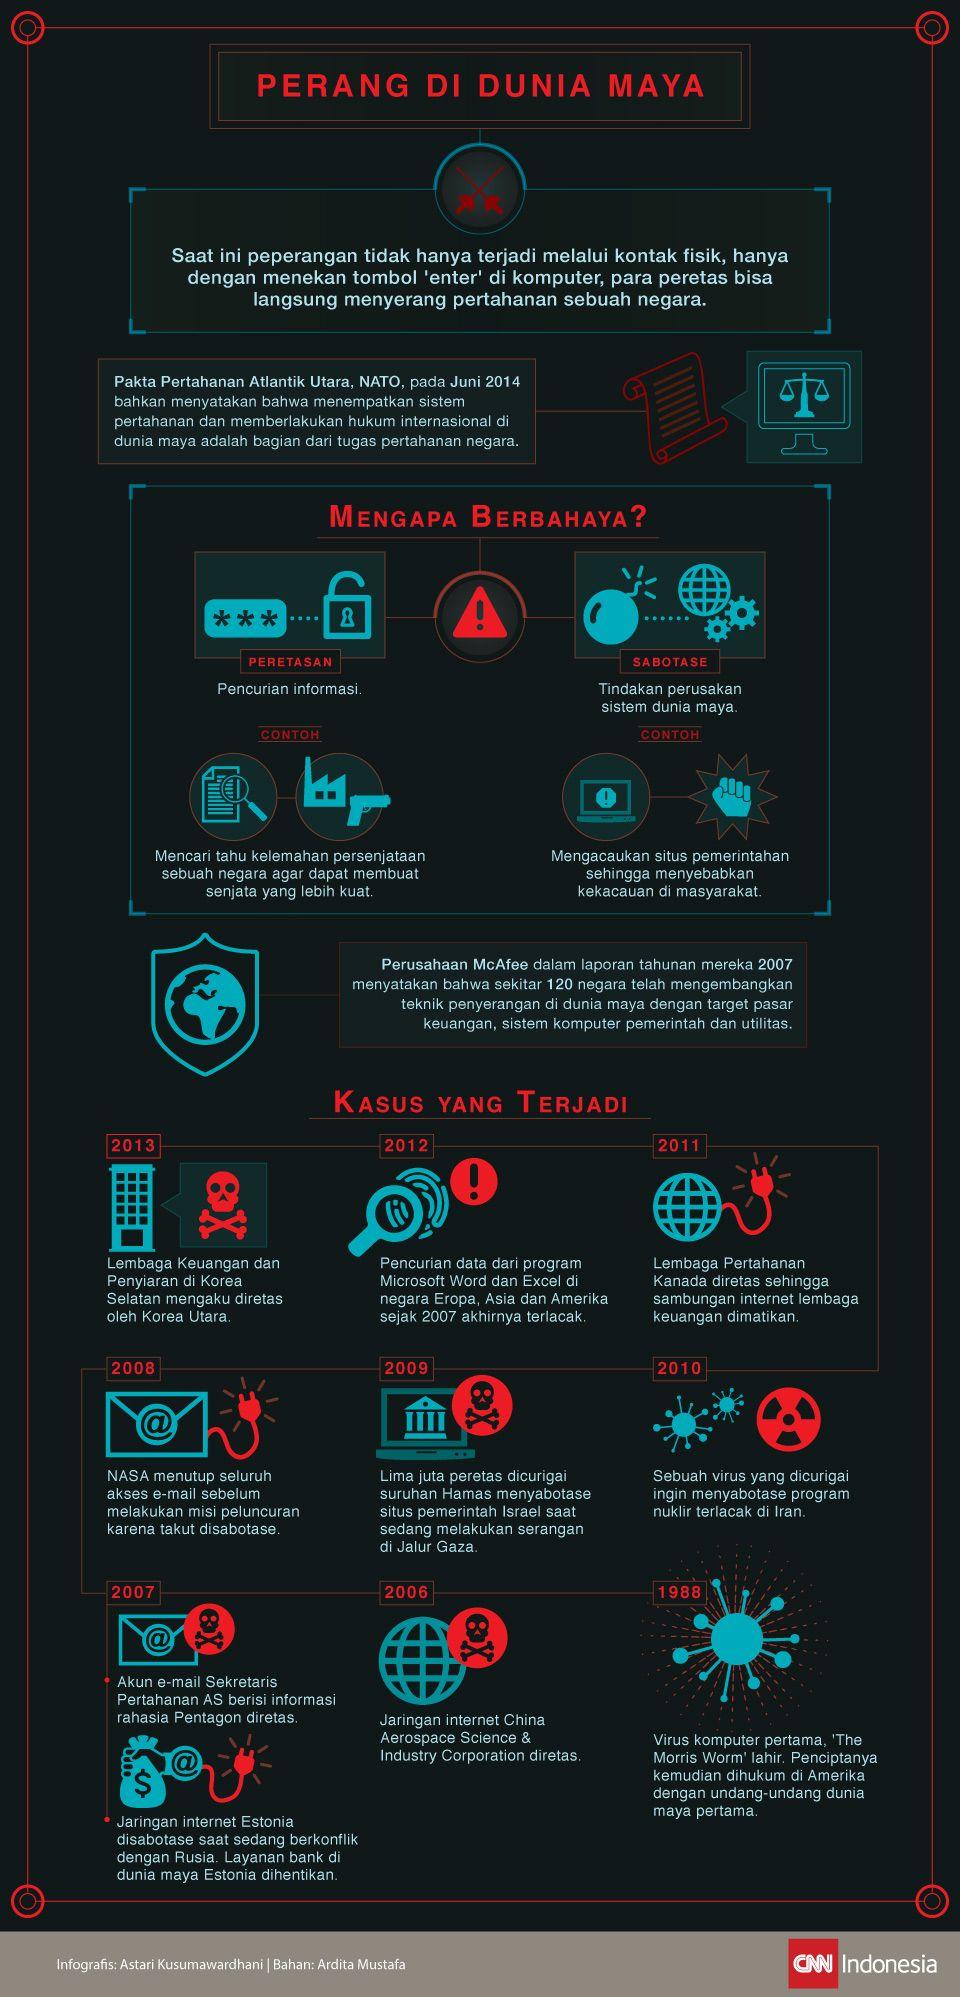 Infografis mengenai informasi seputar kejahatan dalam dunia maya.